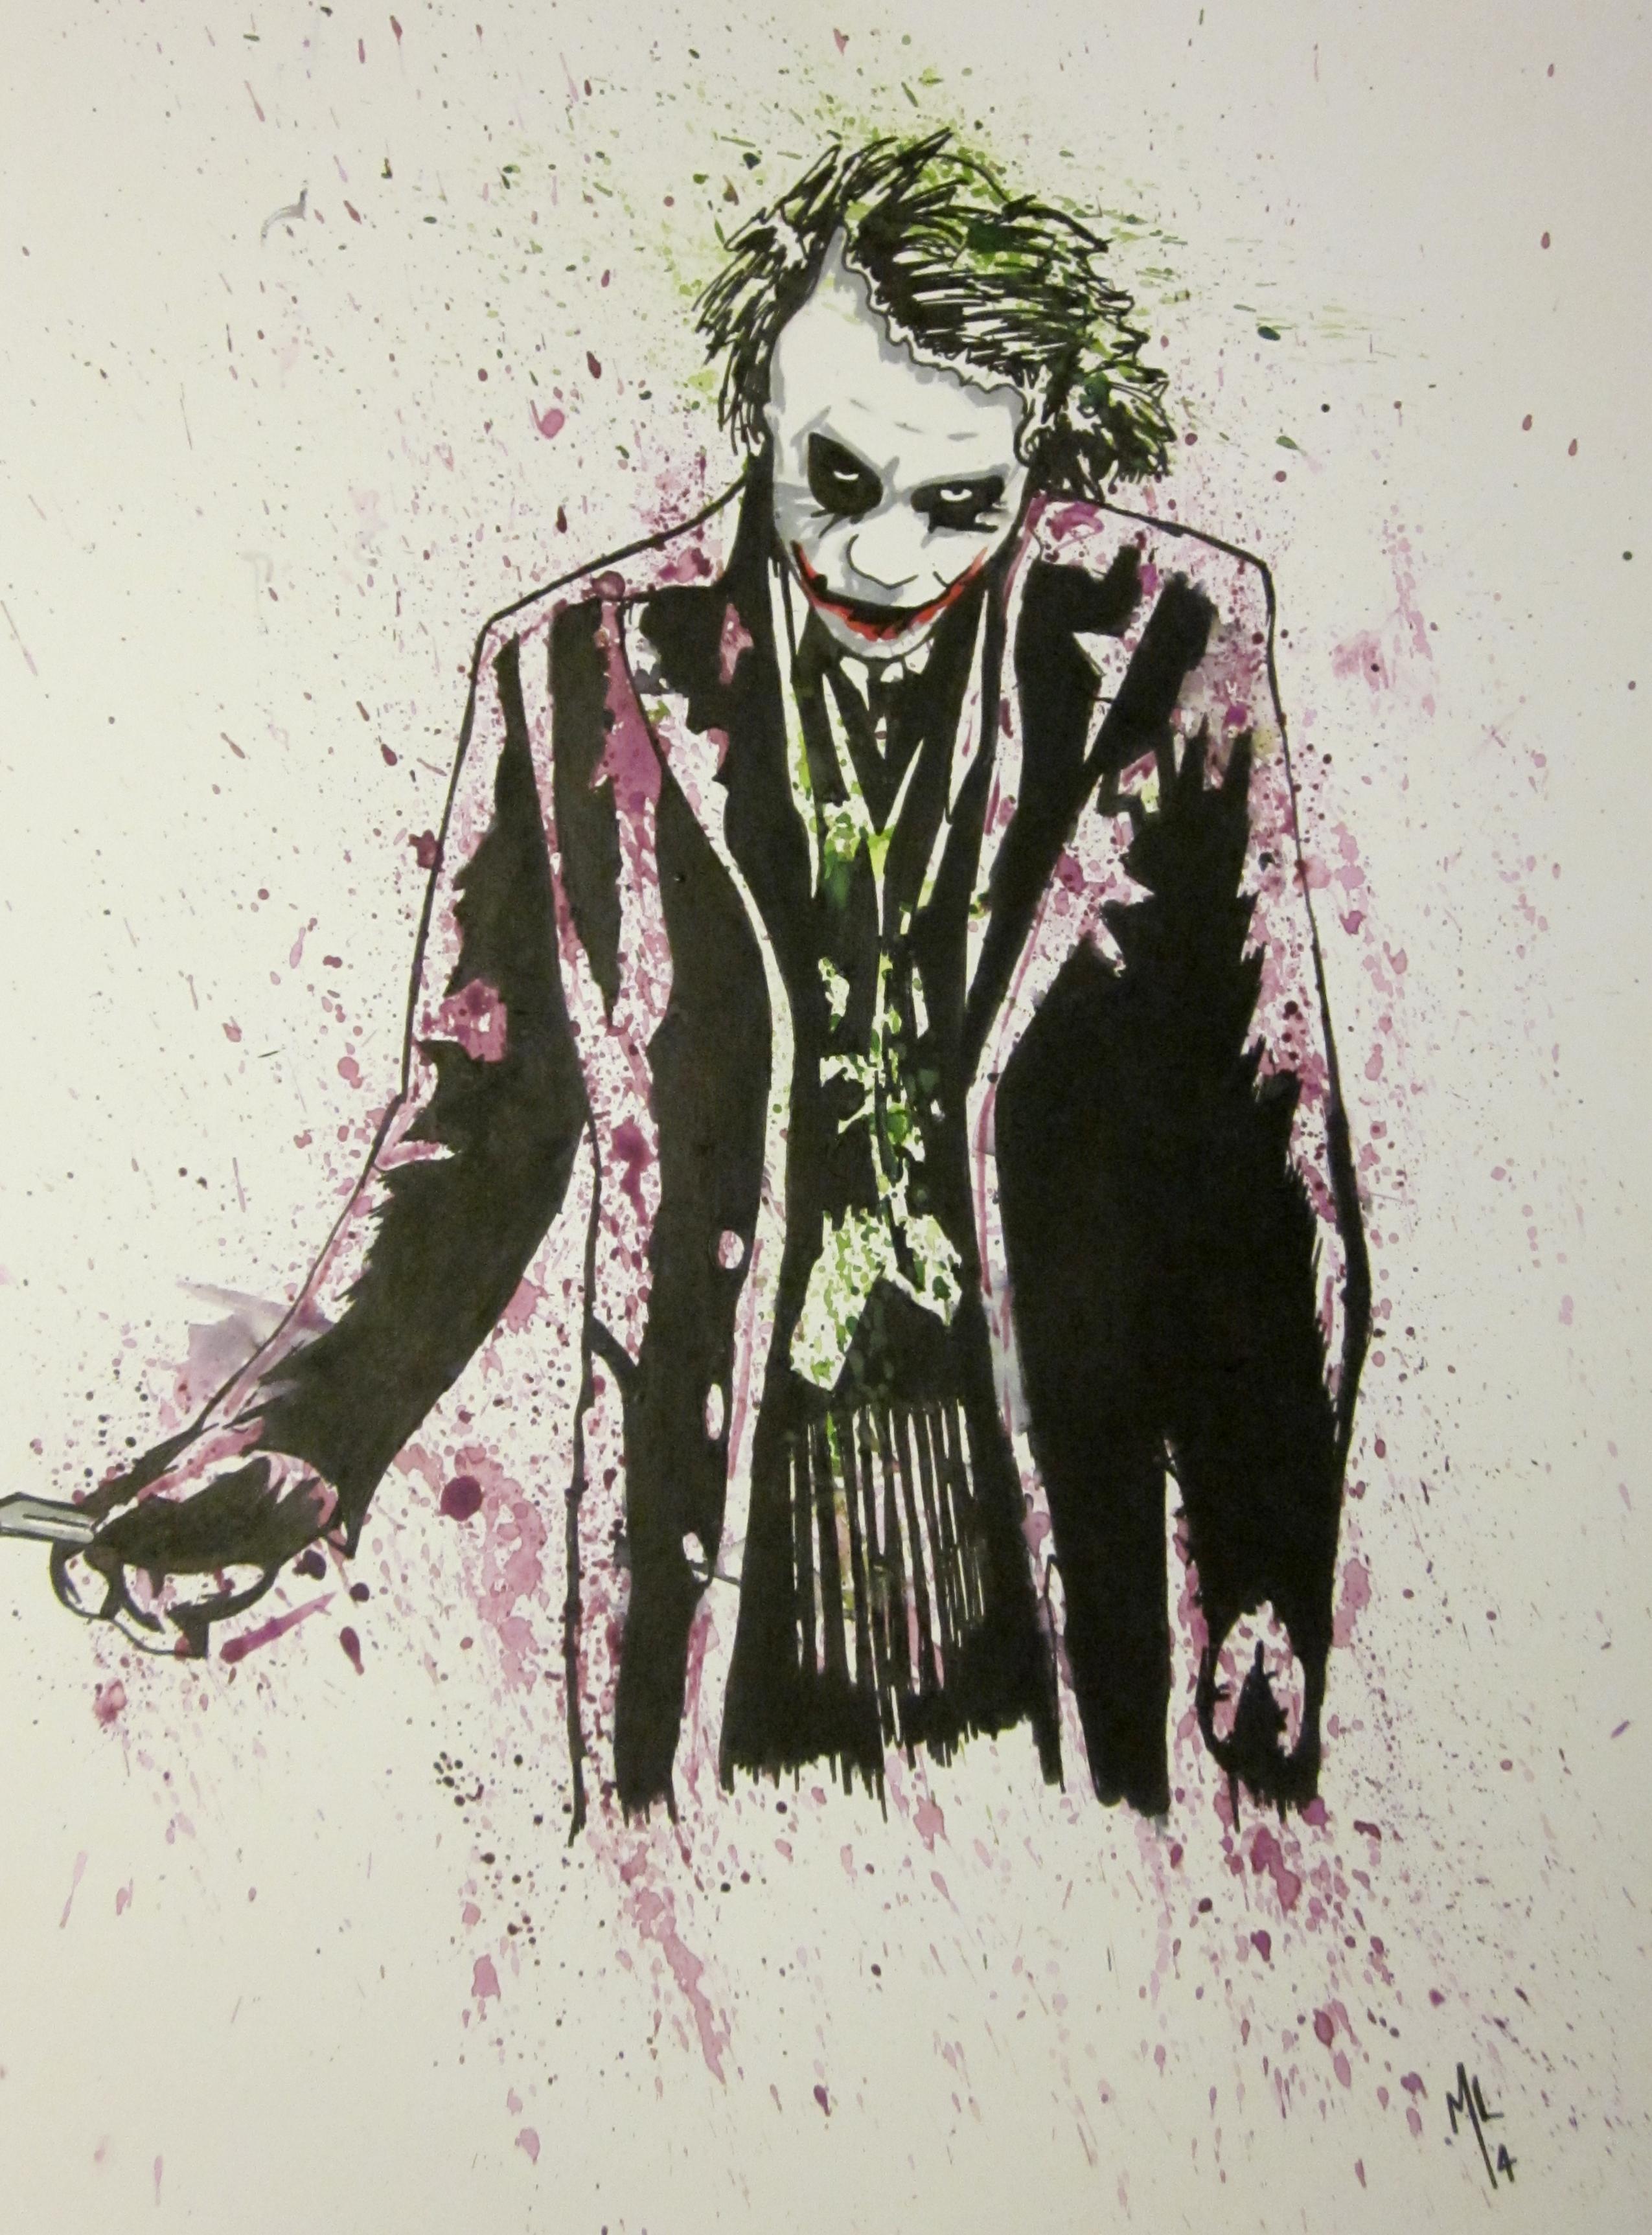 https://www.foundmyself.com/gallery/albums/userpics/49039/59c26jp2shpyj18pcdjb254hgmdzf1.jpg Comic Joker Painting